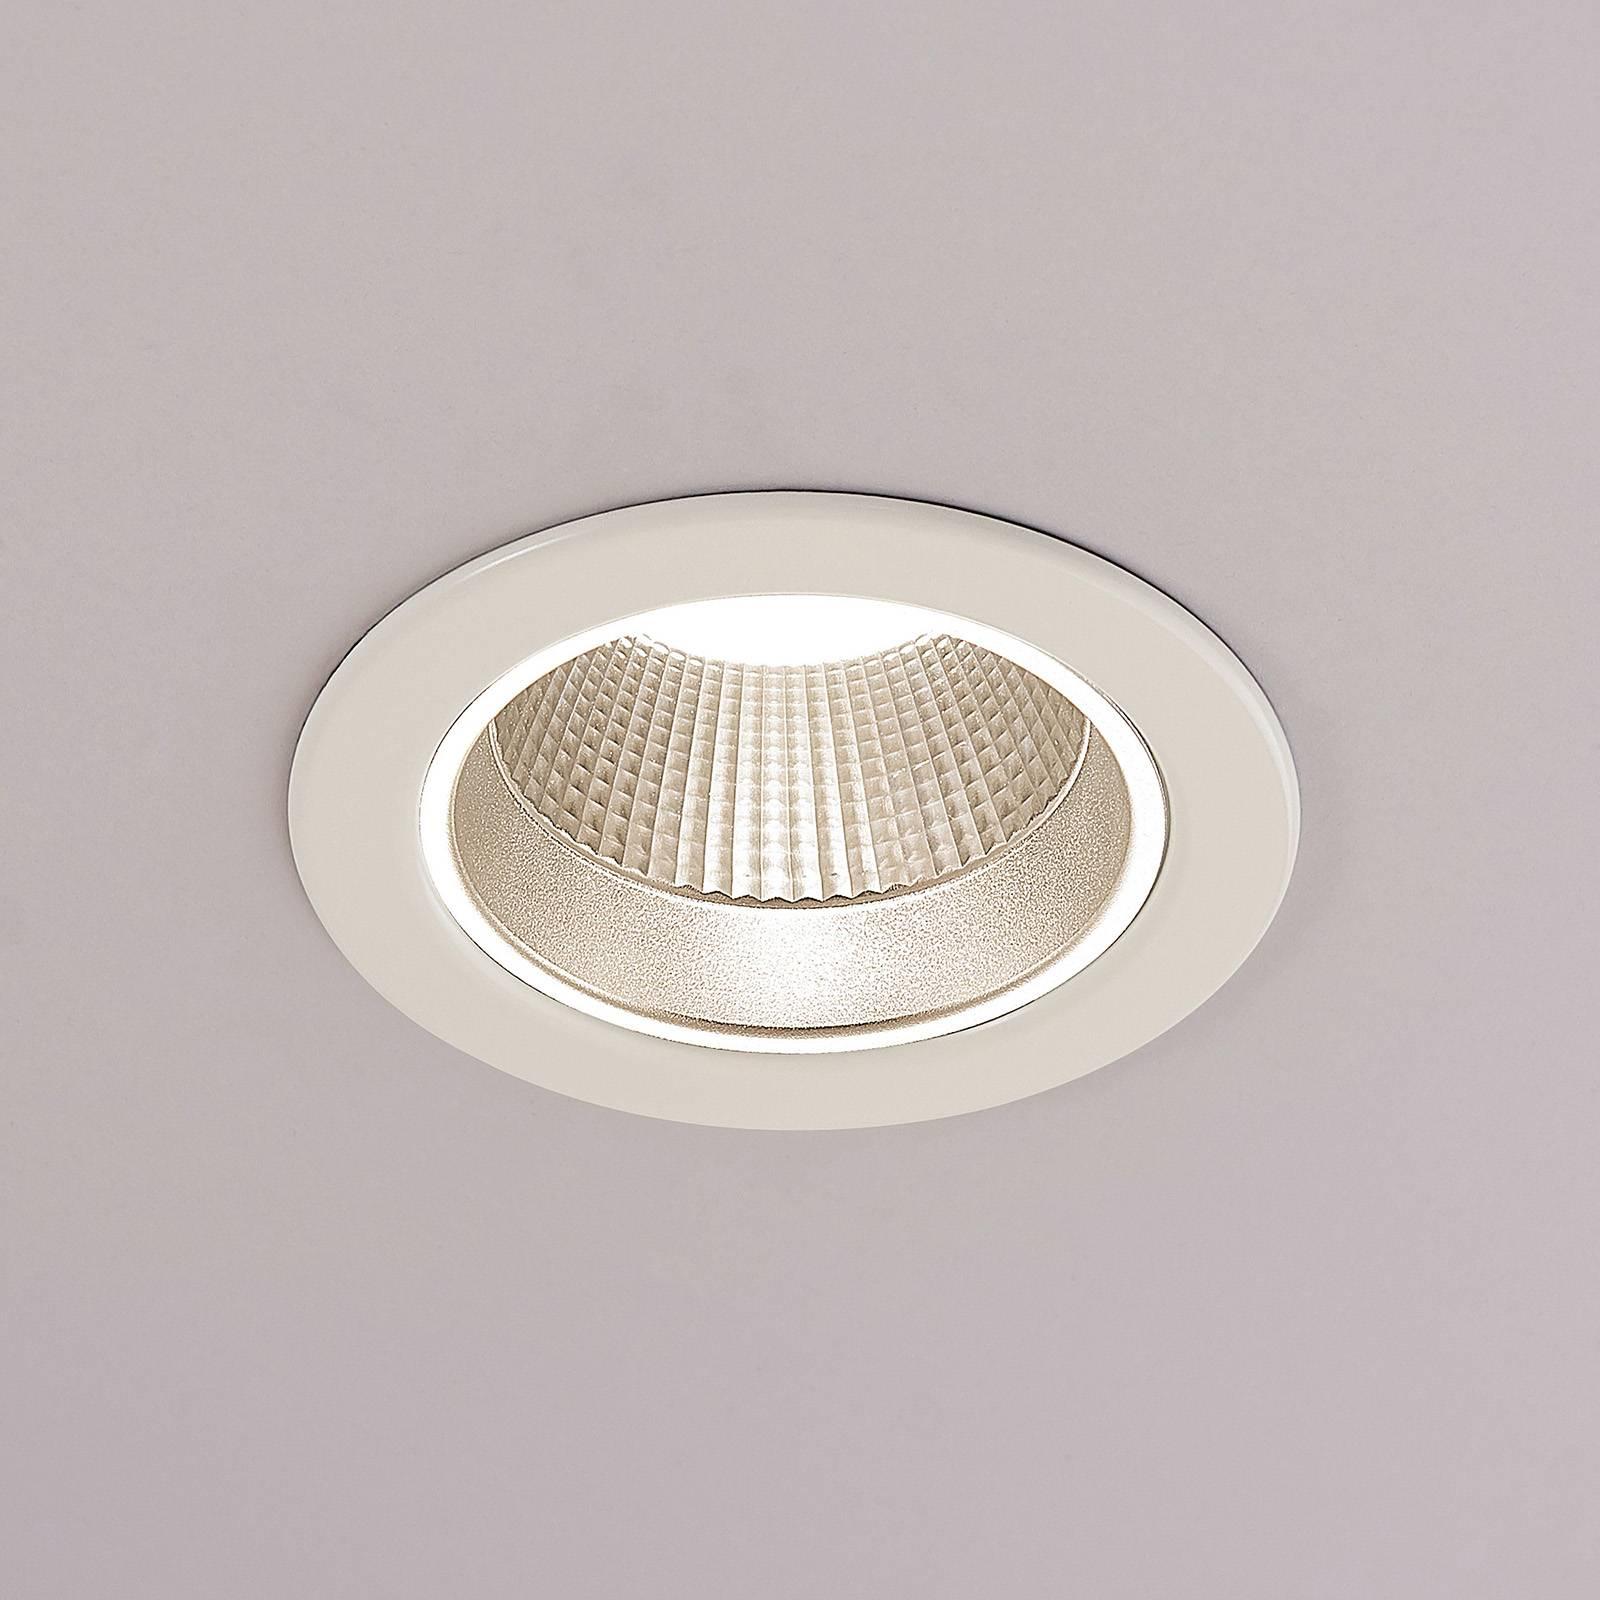 Arcchio Delano LED-kohdevalaisin, Ø 11,3 cm